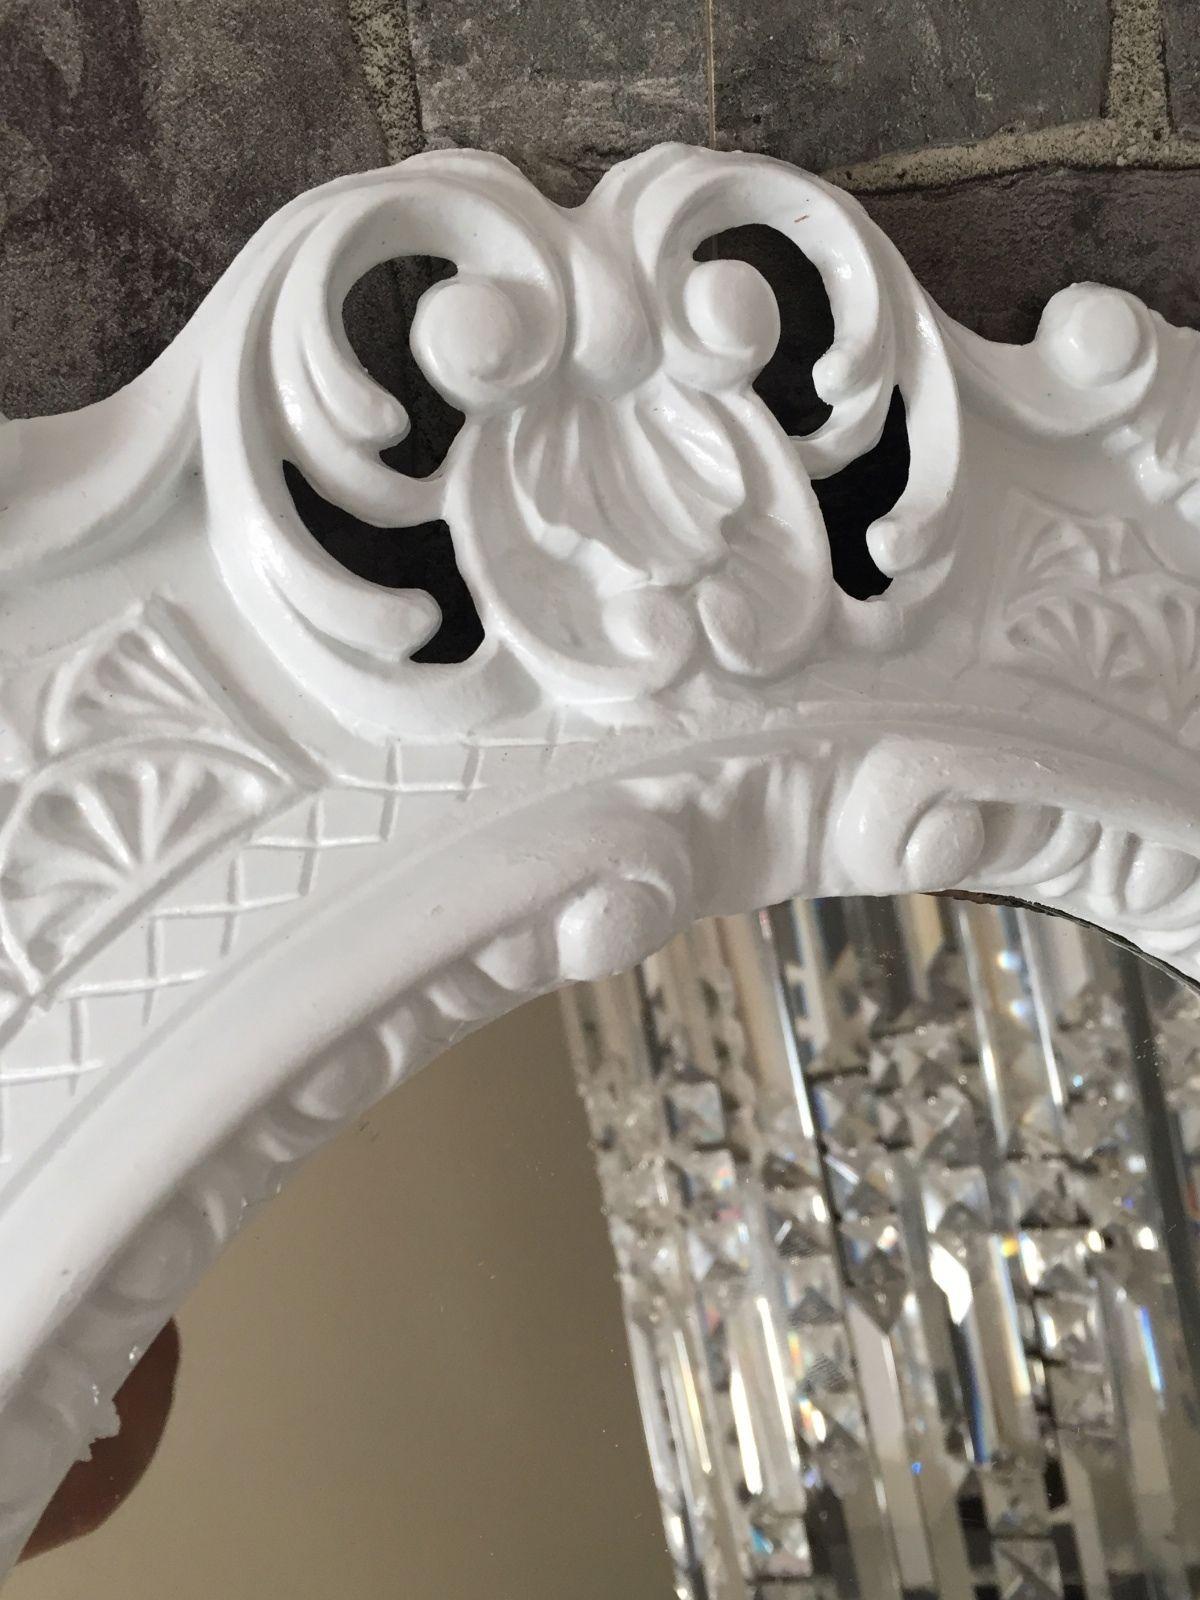 wandspiegel wei barock oval spiegel antik 45x38 bad flur kosmetikspiegel rahmen kaufen bei. Black Bedroom Furniture Sets. Home Design Ideas